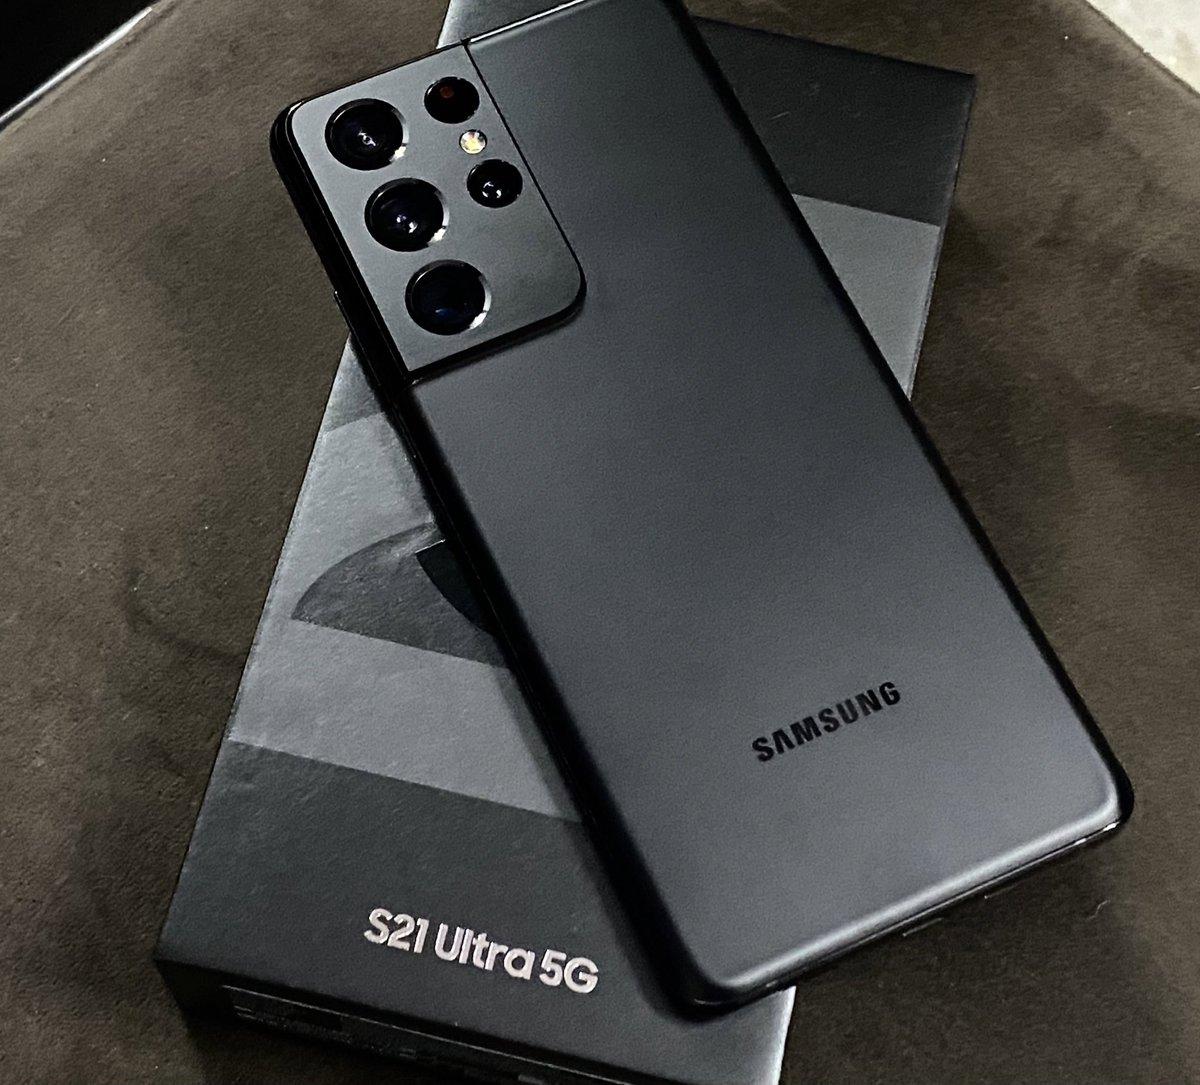 #blackbeauty #SamsungUnpacked